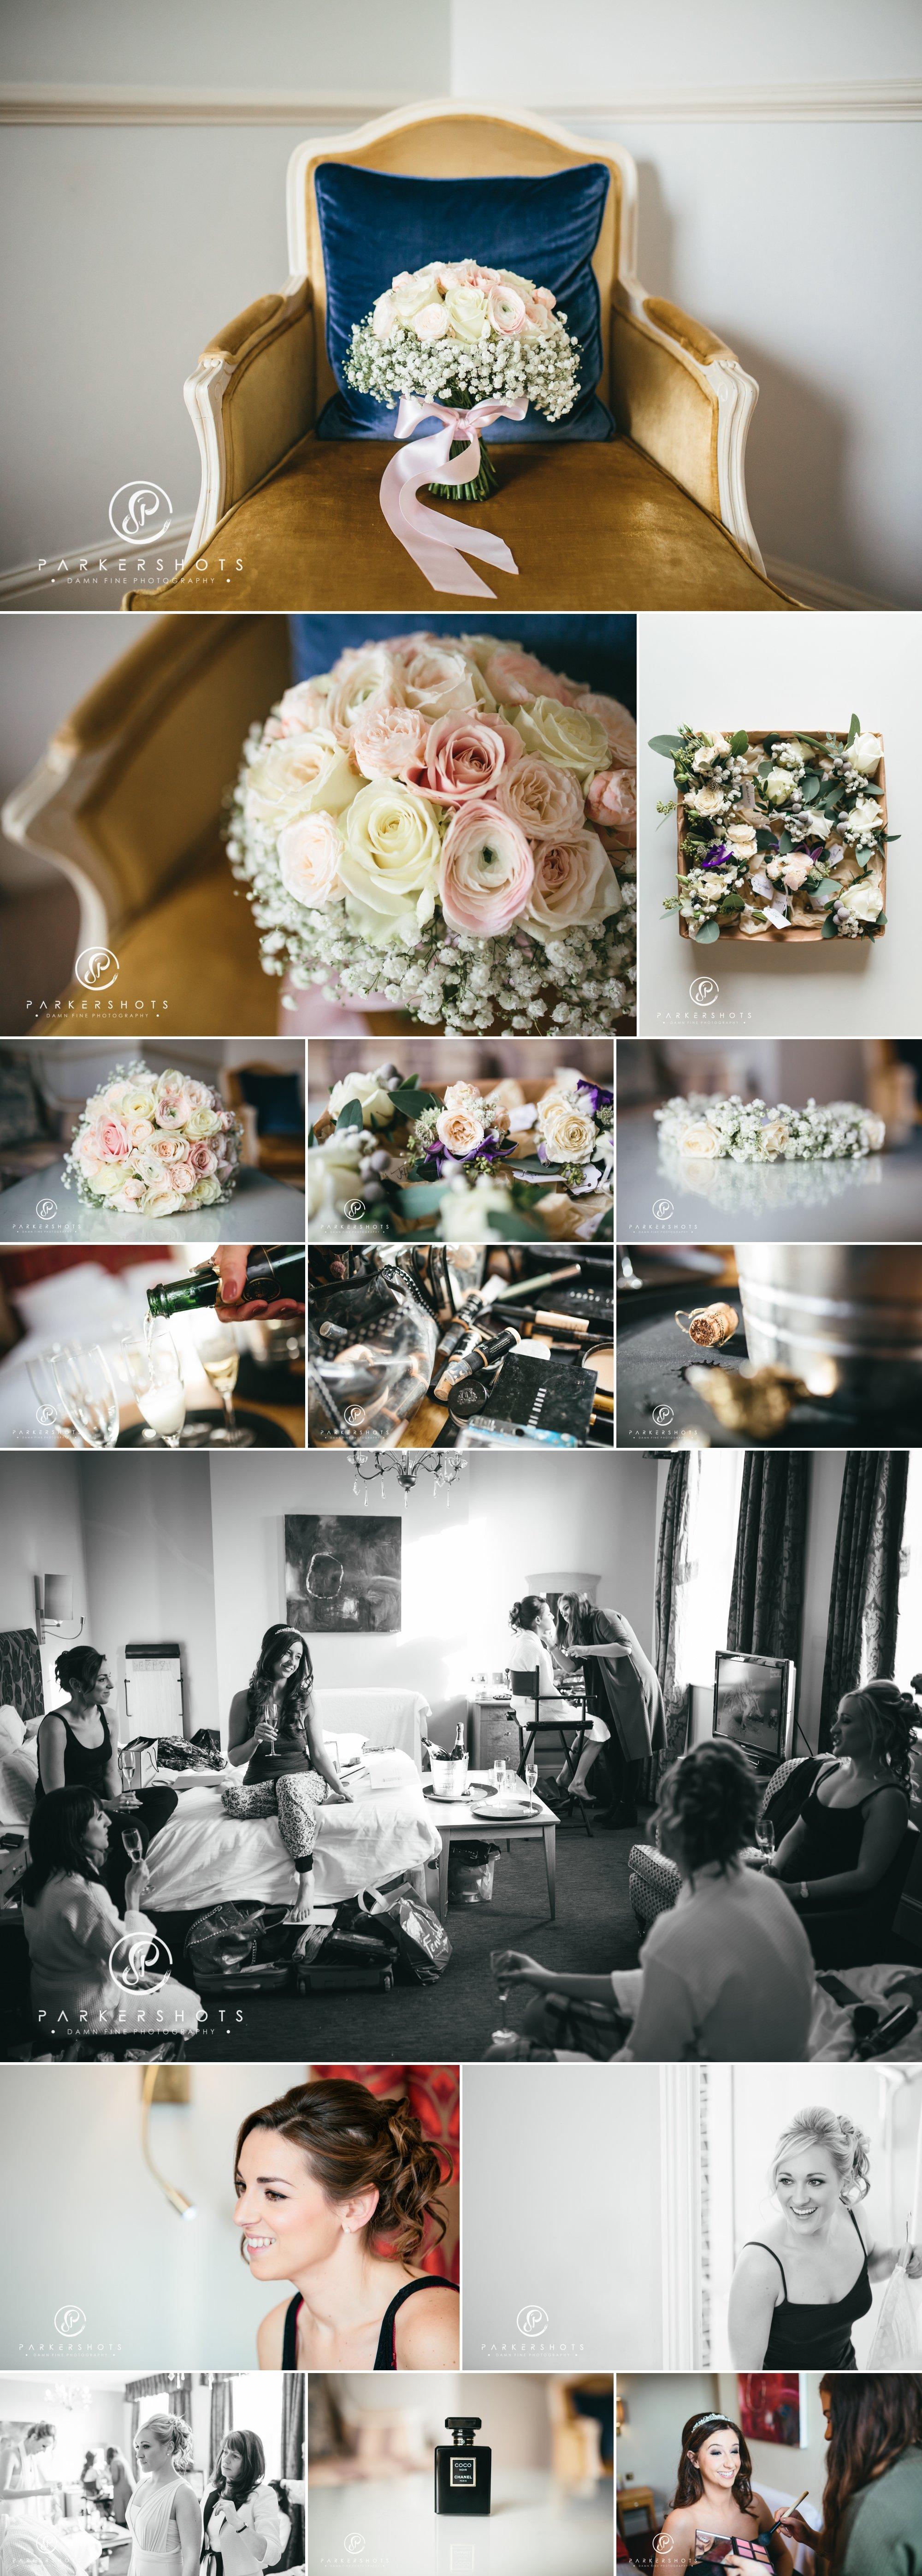 The Spa Hotel Wedding Photographer (2)